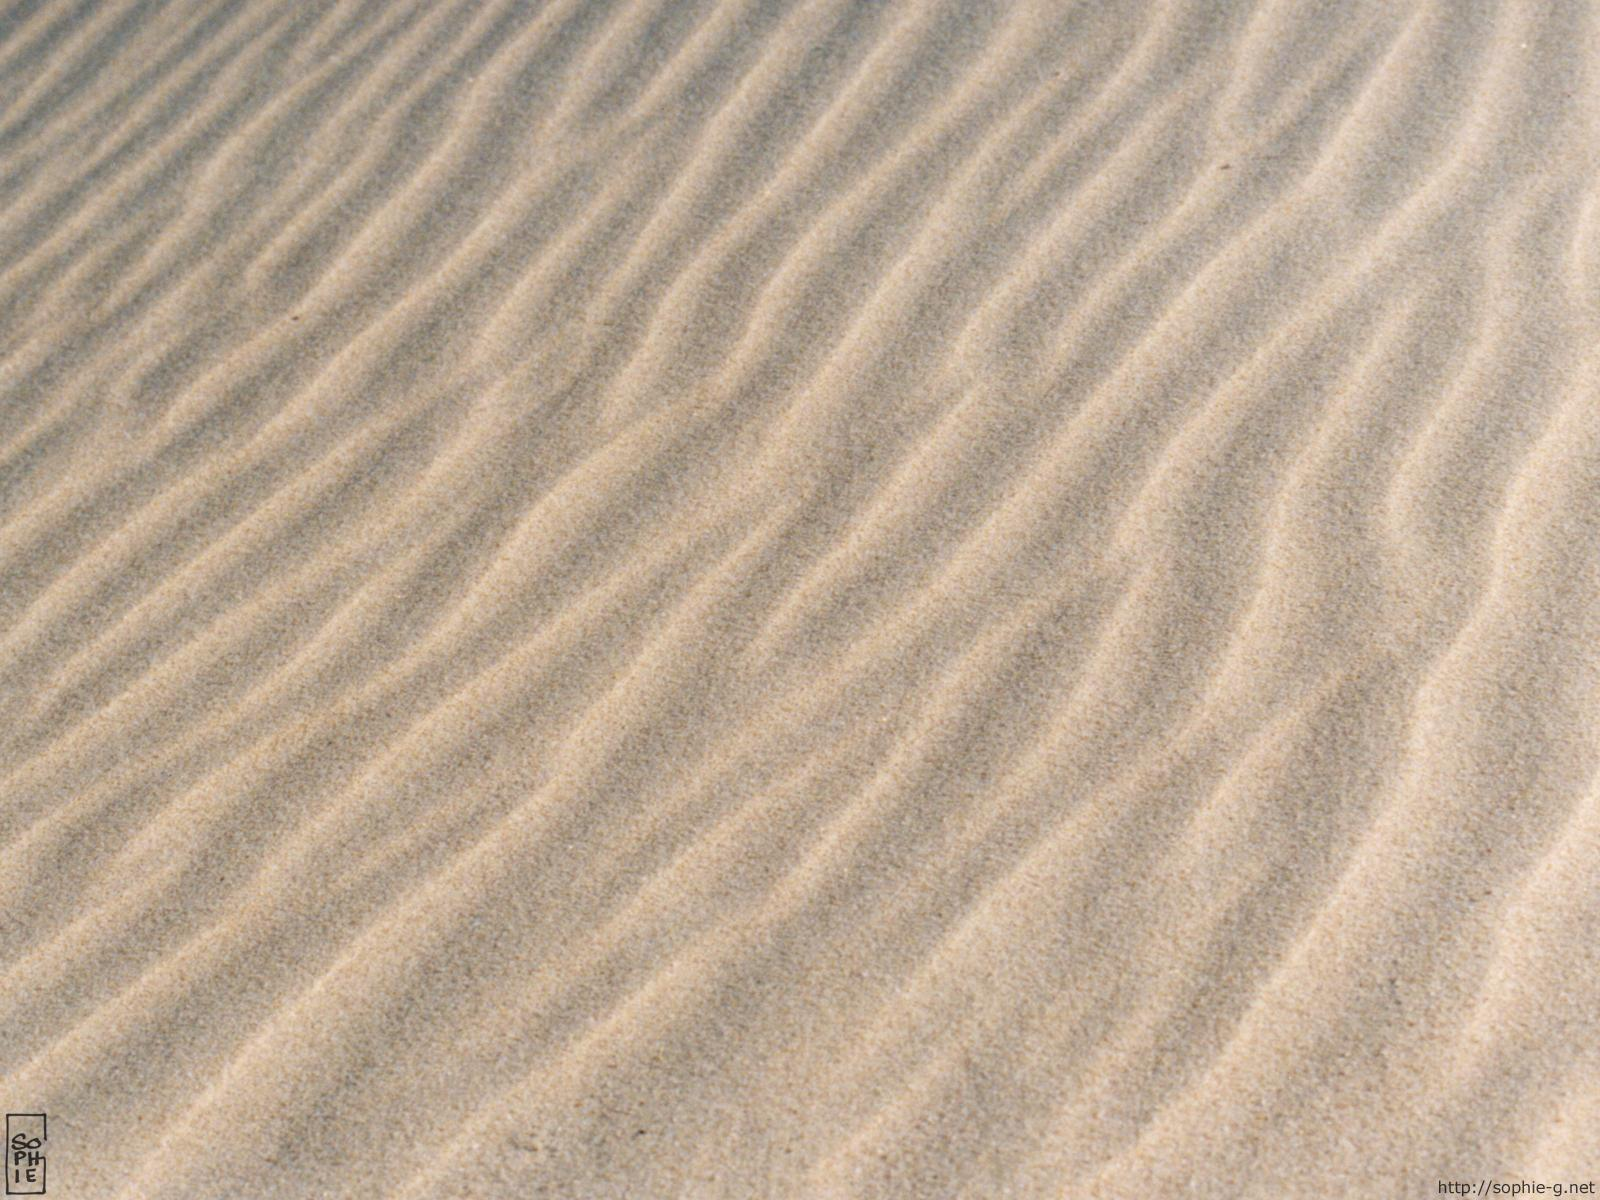 fond d écran sable